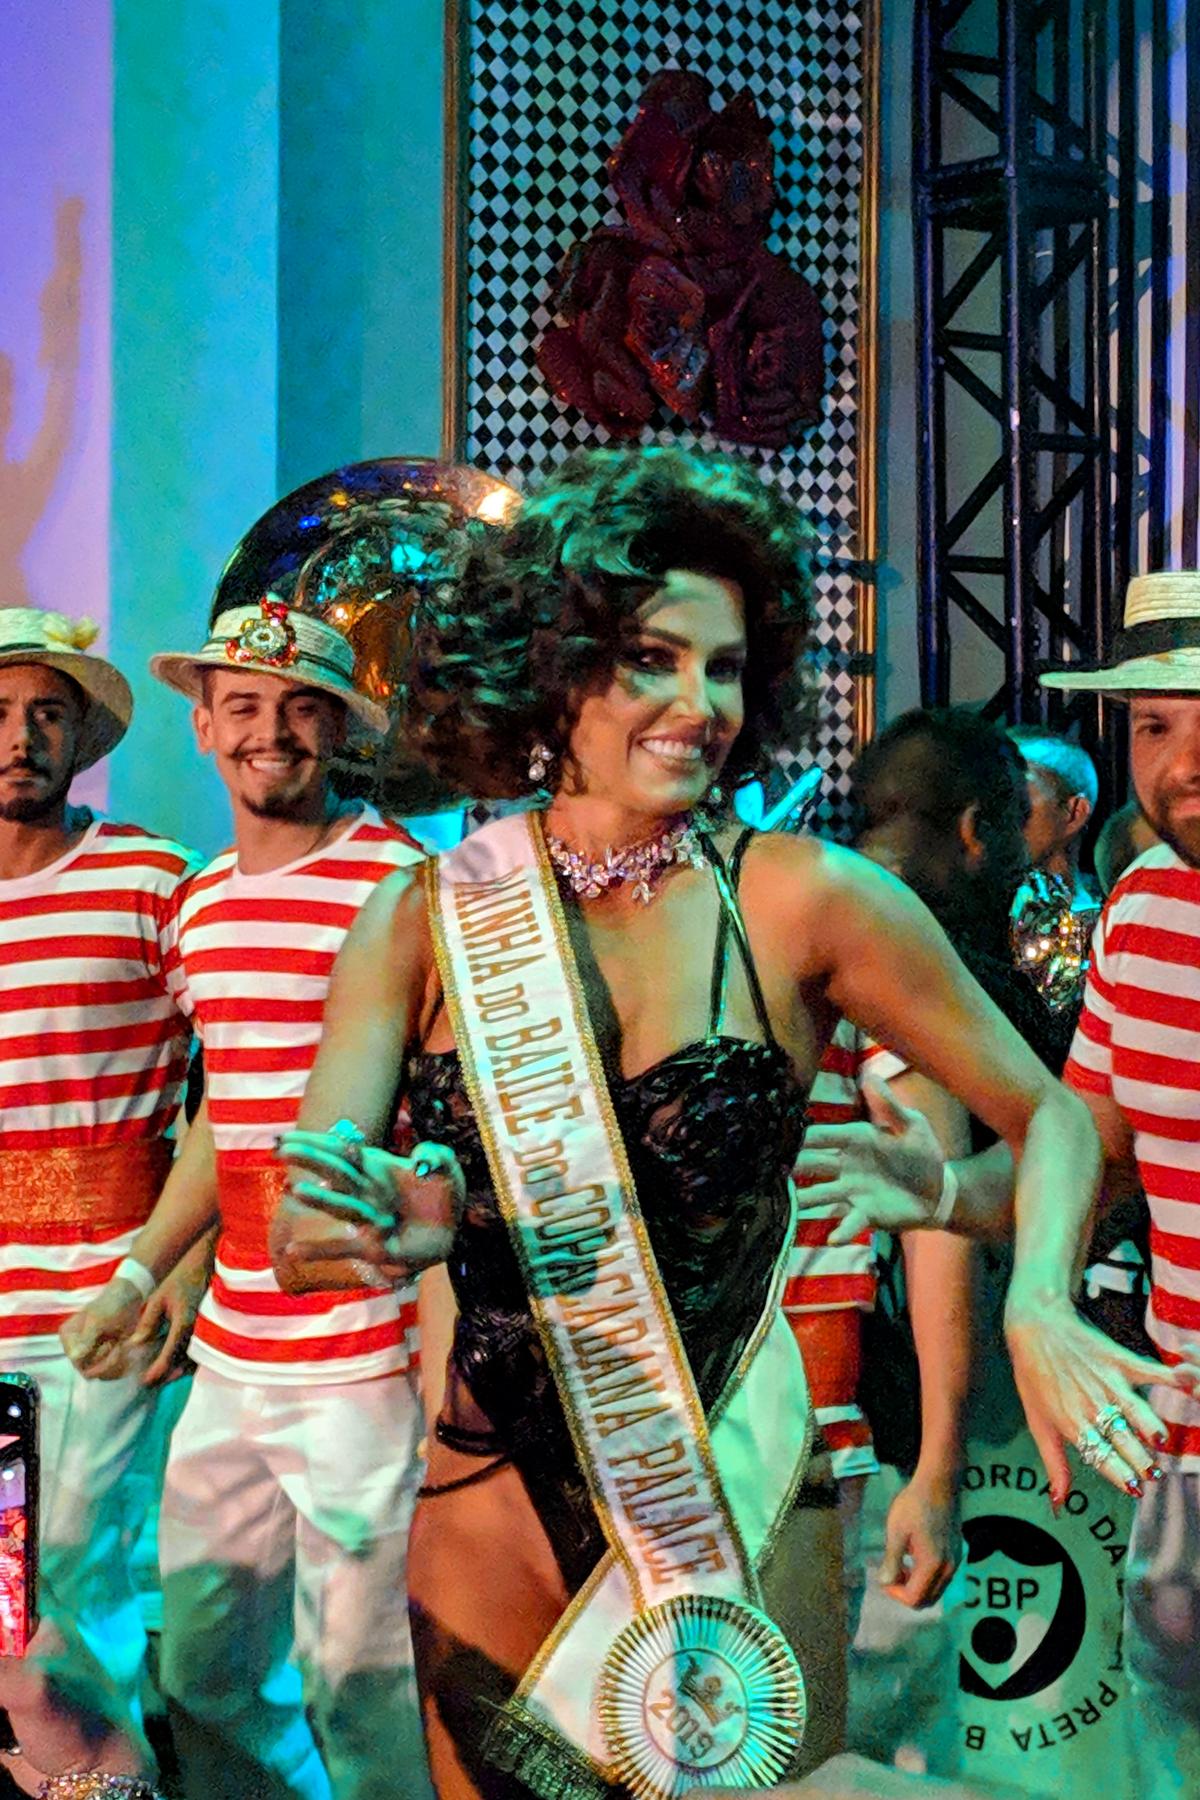 Stacie Flinner x Belmond Copacabana Carnival Ball-44.jpg